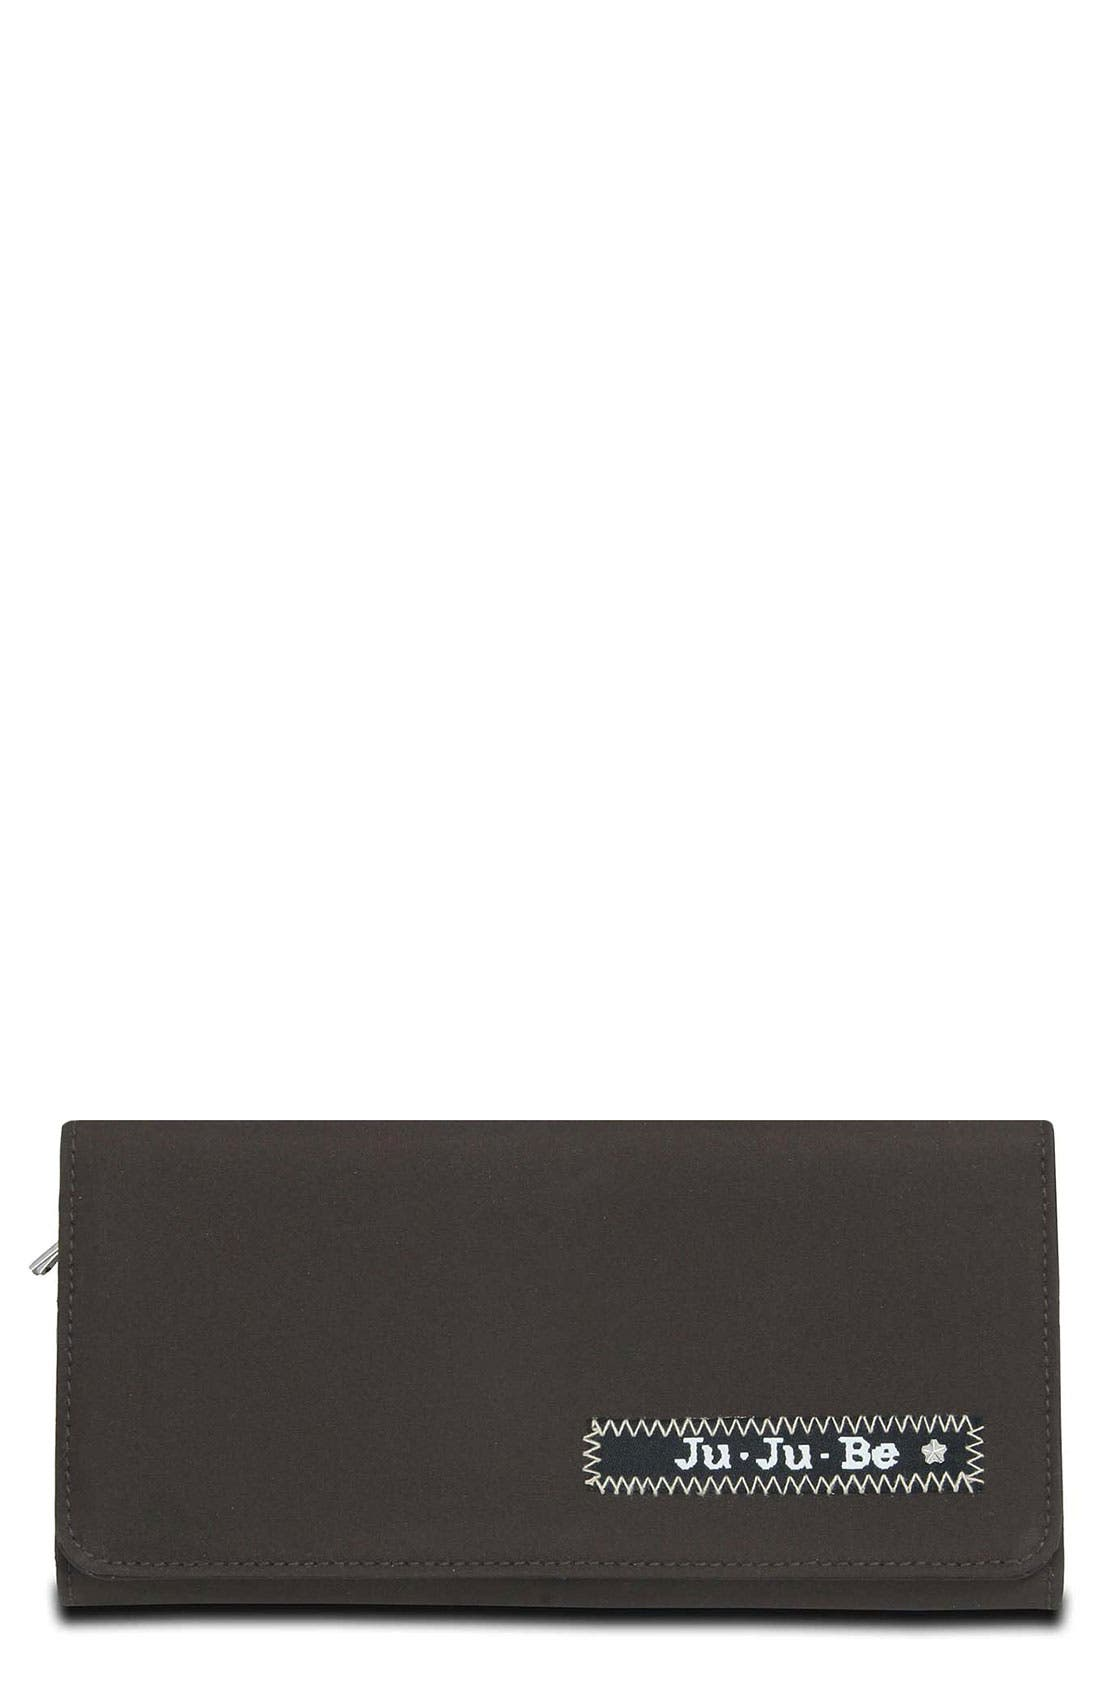 Main Image - Ju-Ju-Be 'Be Rich' Checkbook Wallet